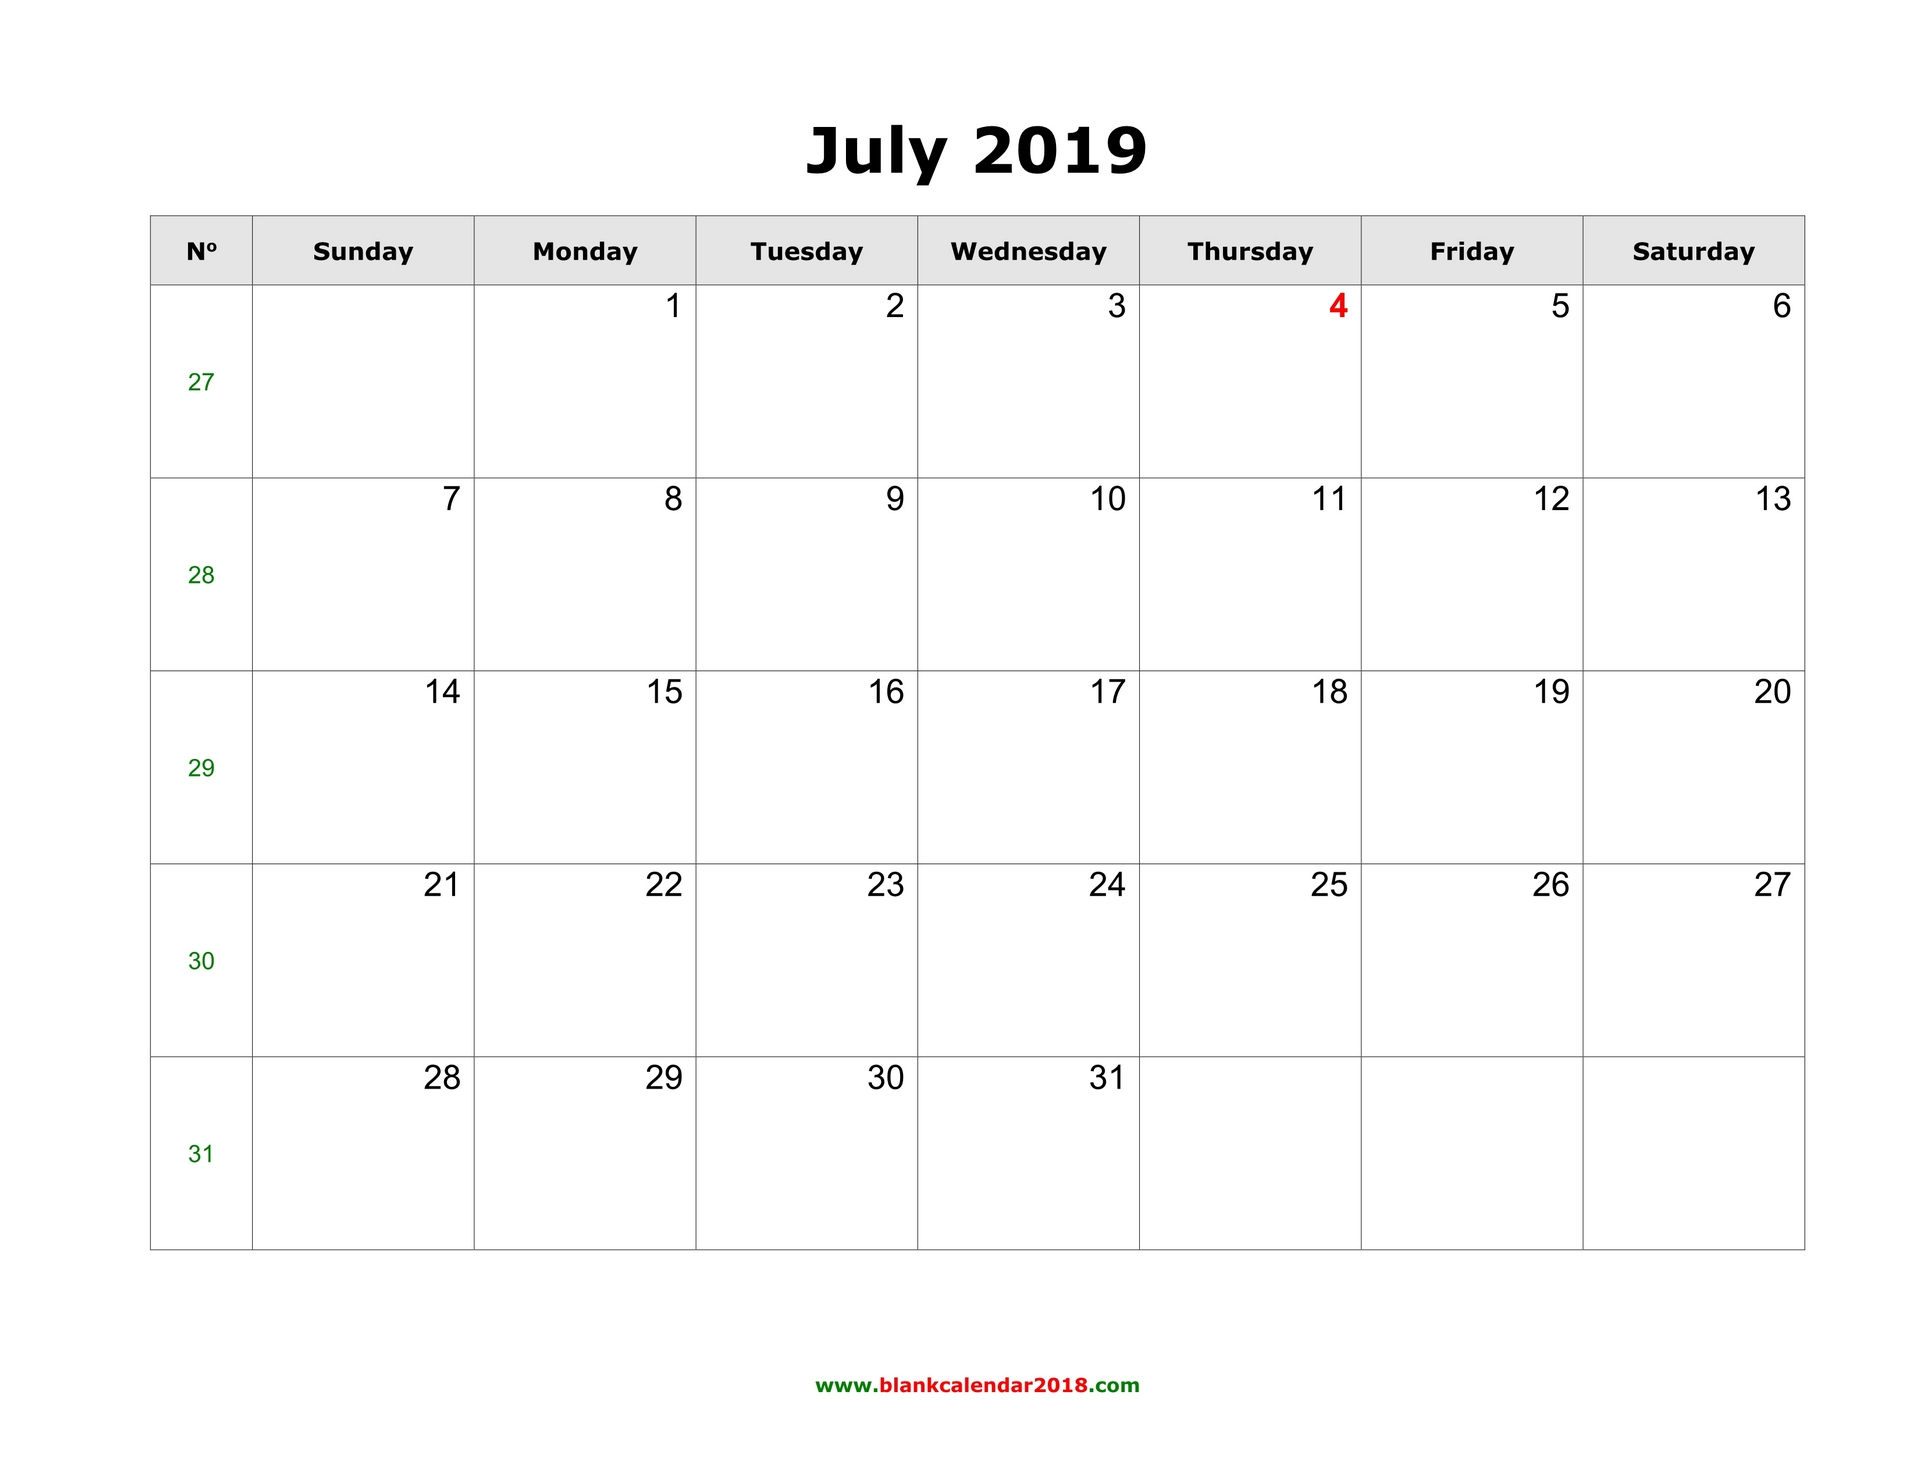 Blank Calendar For July 2019